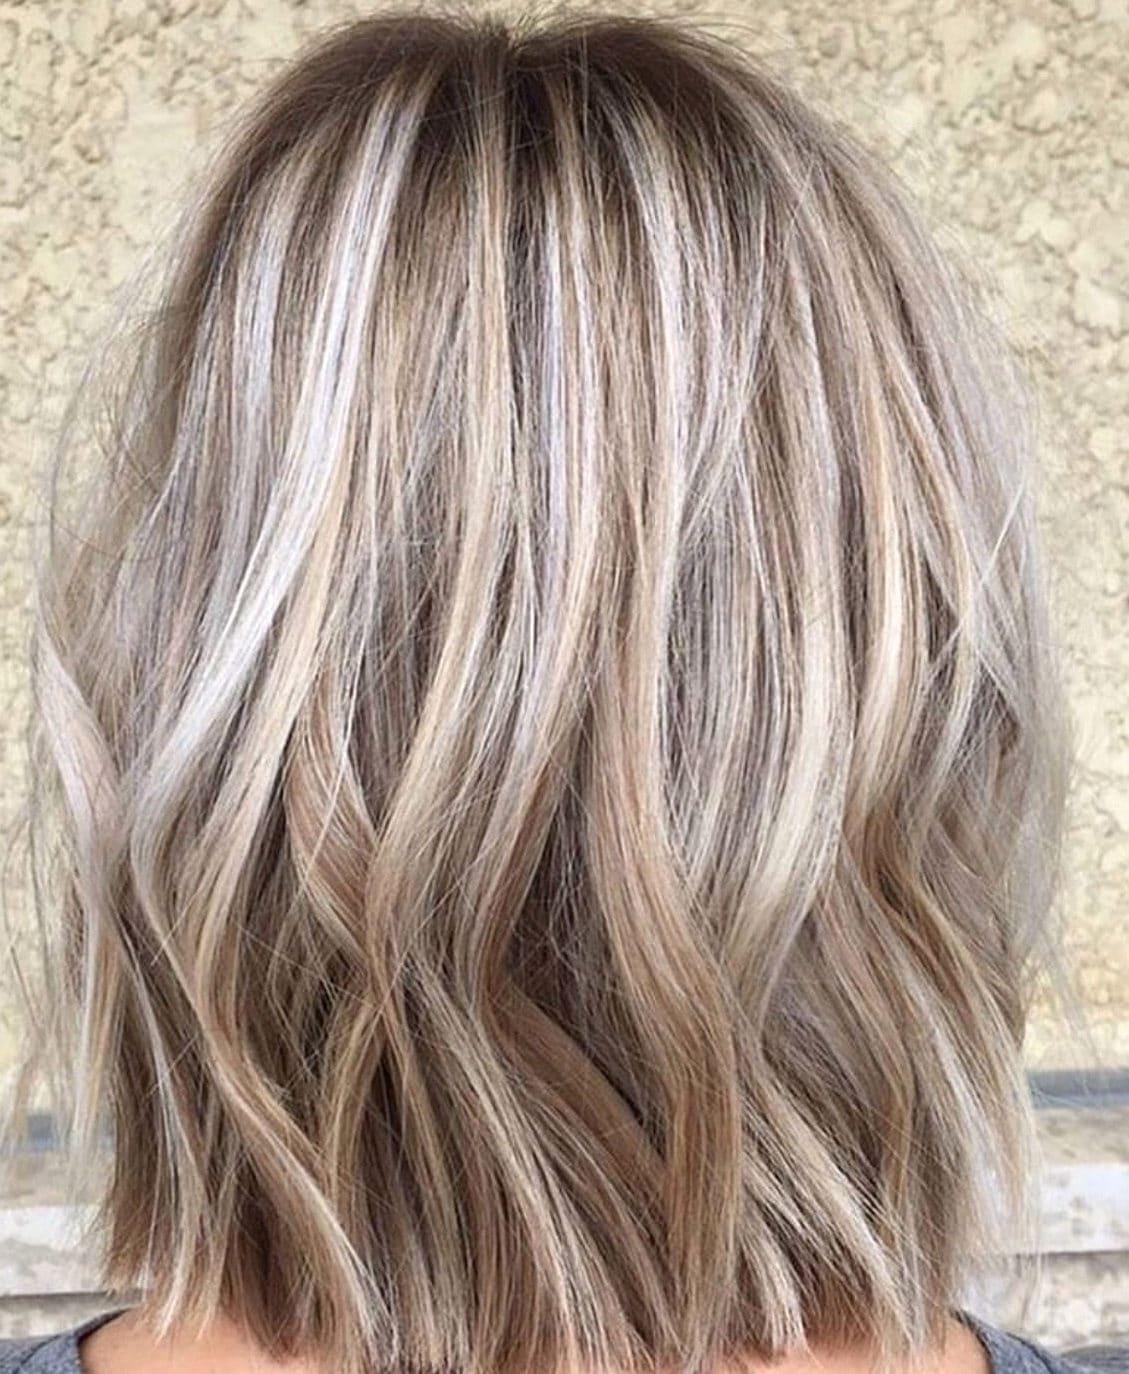 Dark blonde hair colors for short hair